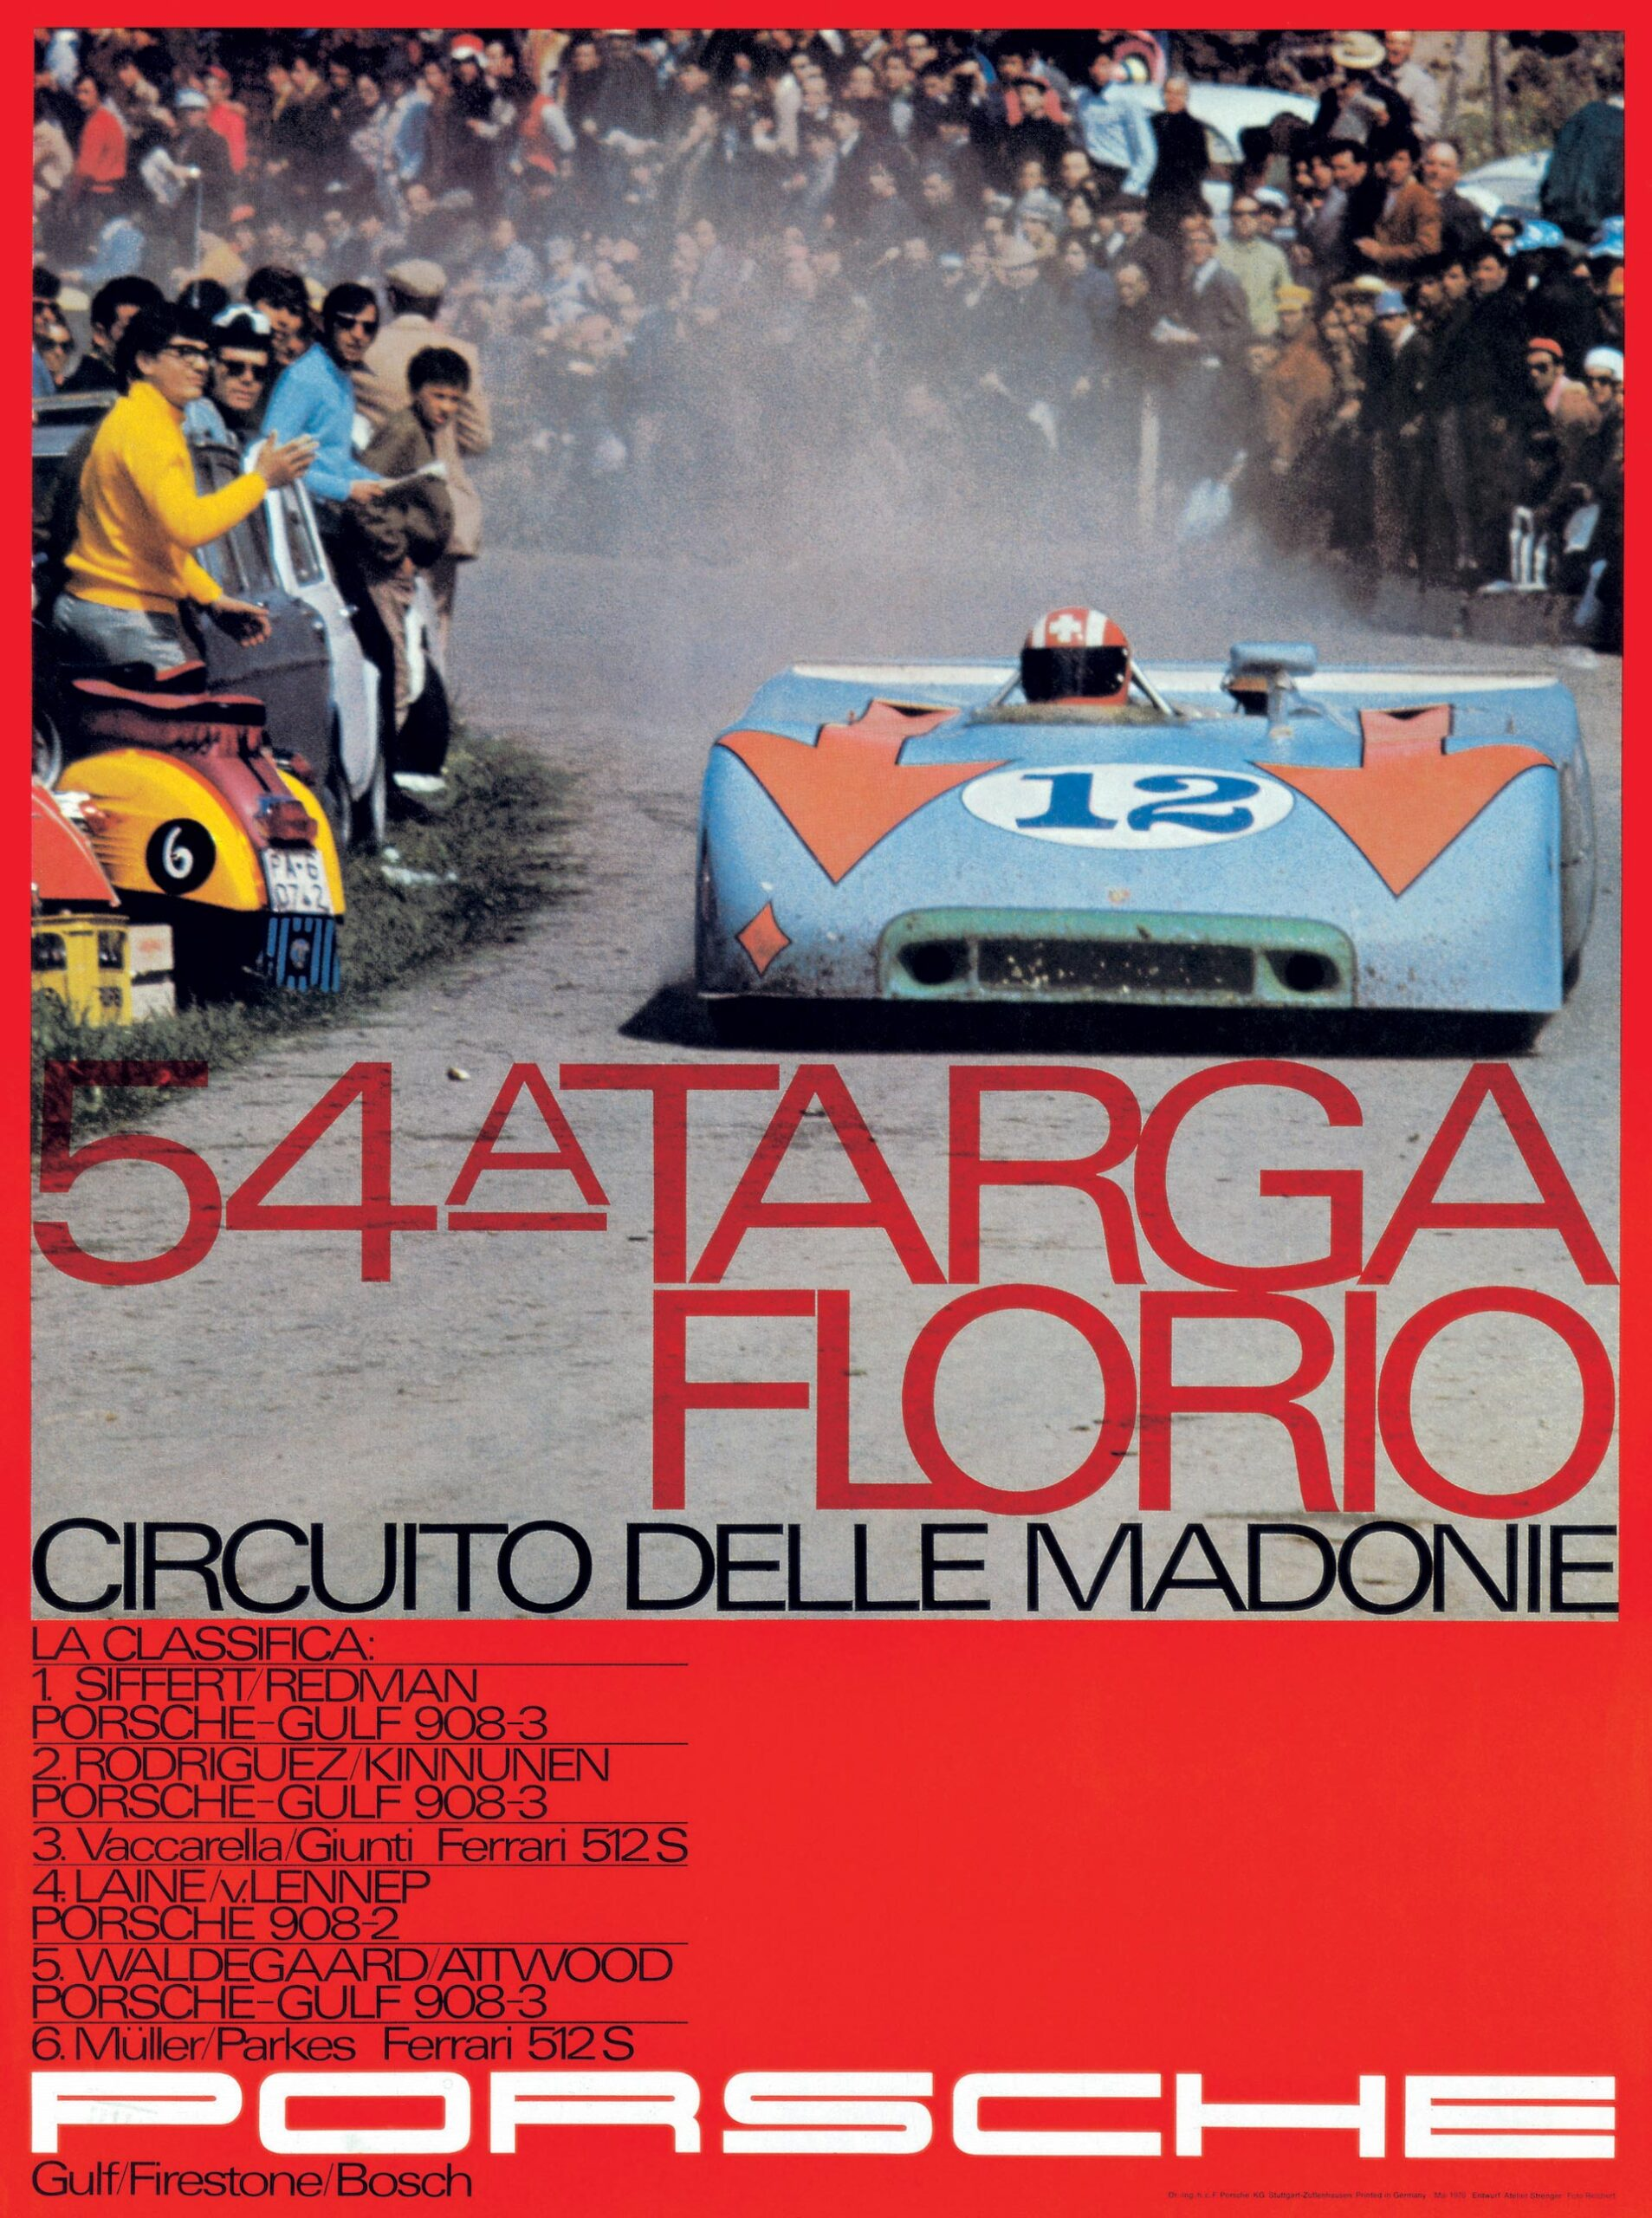 Plakat Porsche 54 Targa Florio 1970